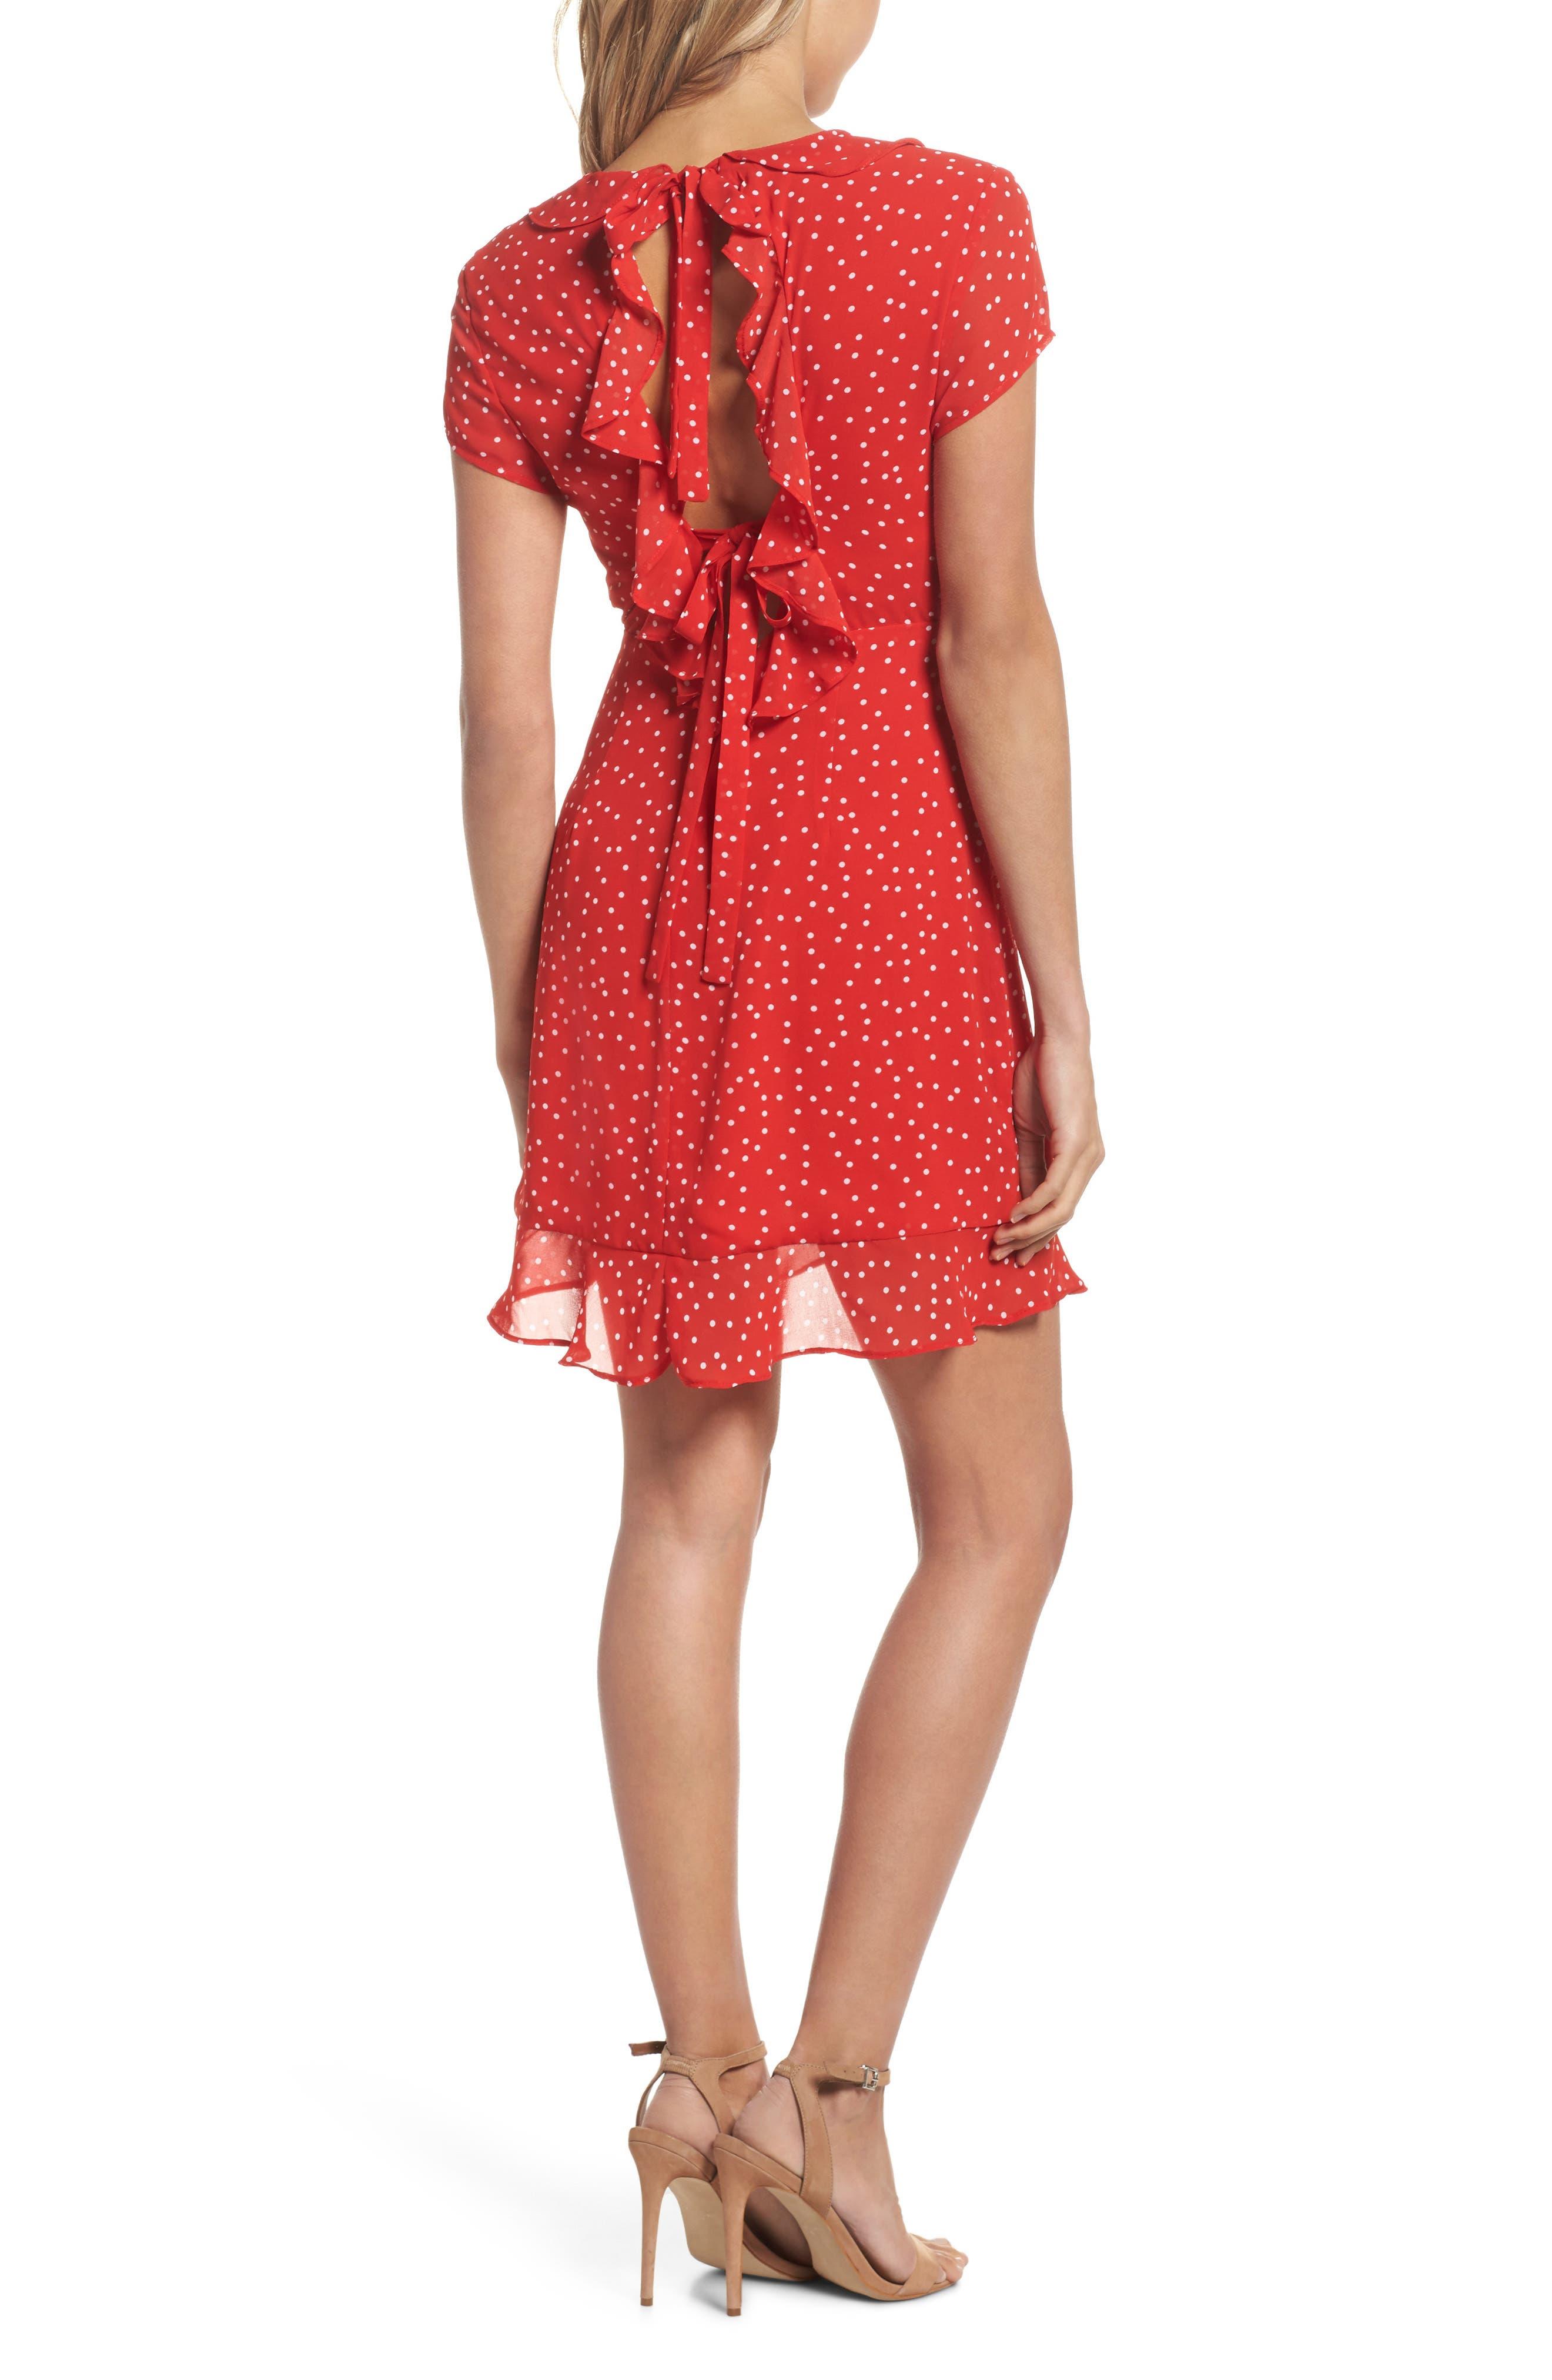 Alternate Image 3  - Bardot Polka Dot Ruffle Dress